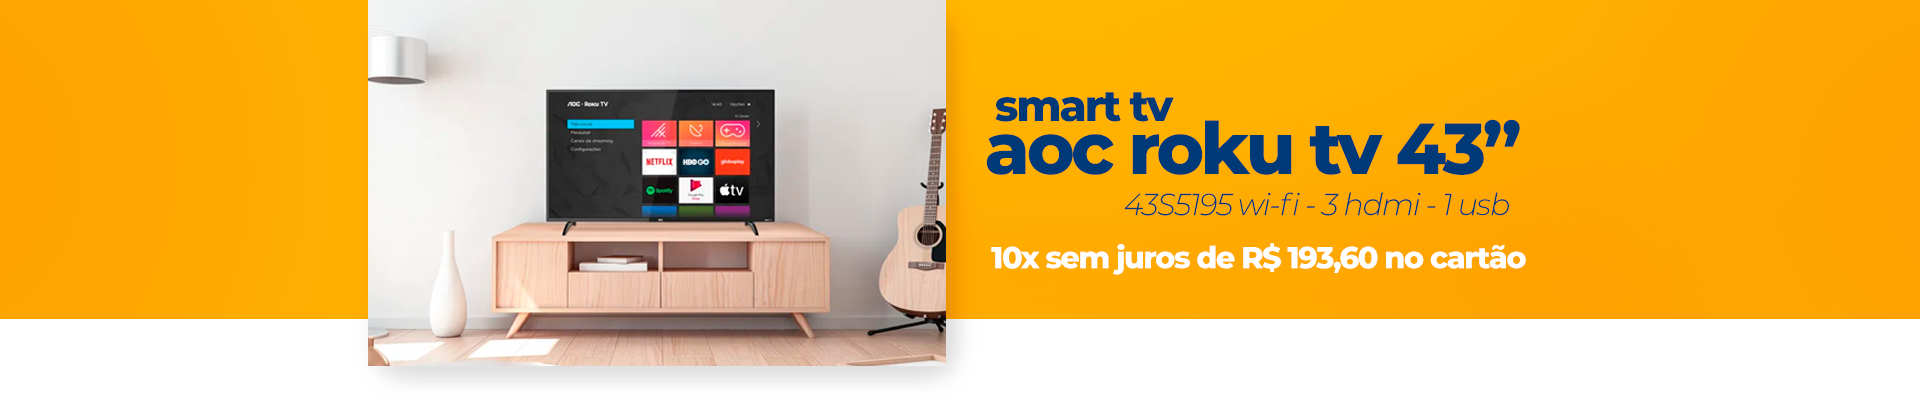 JUNHO - SmartTV AOC